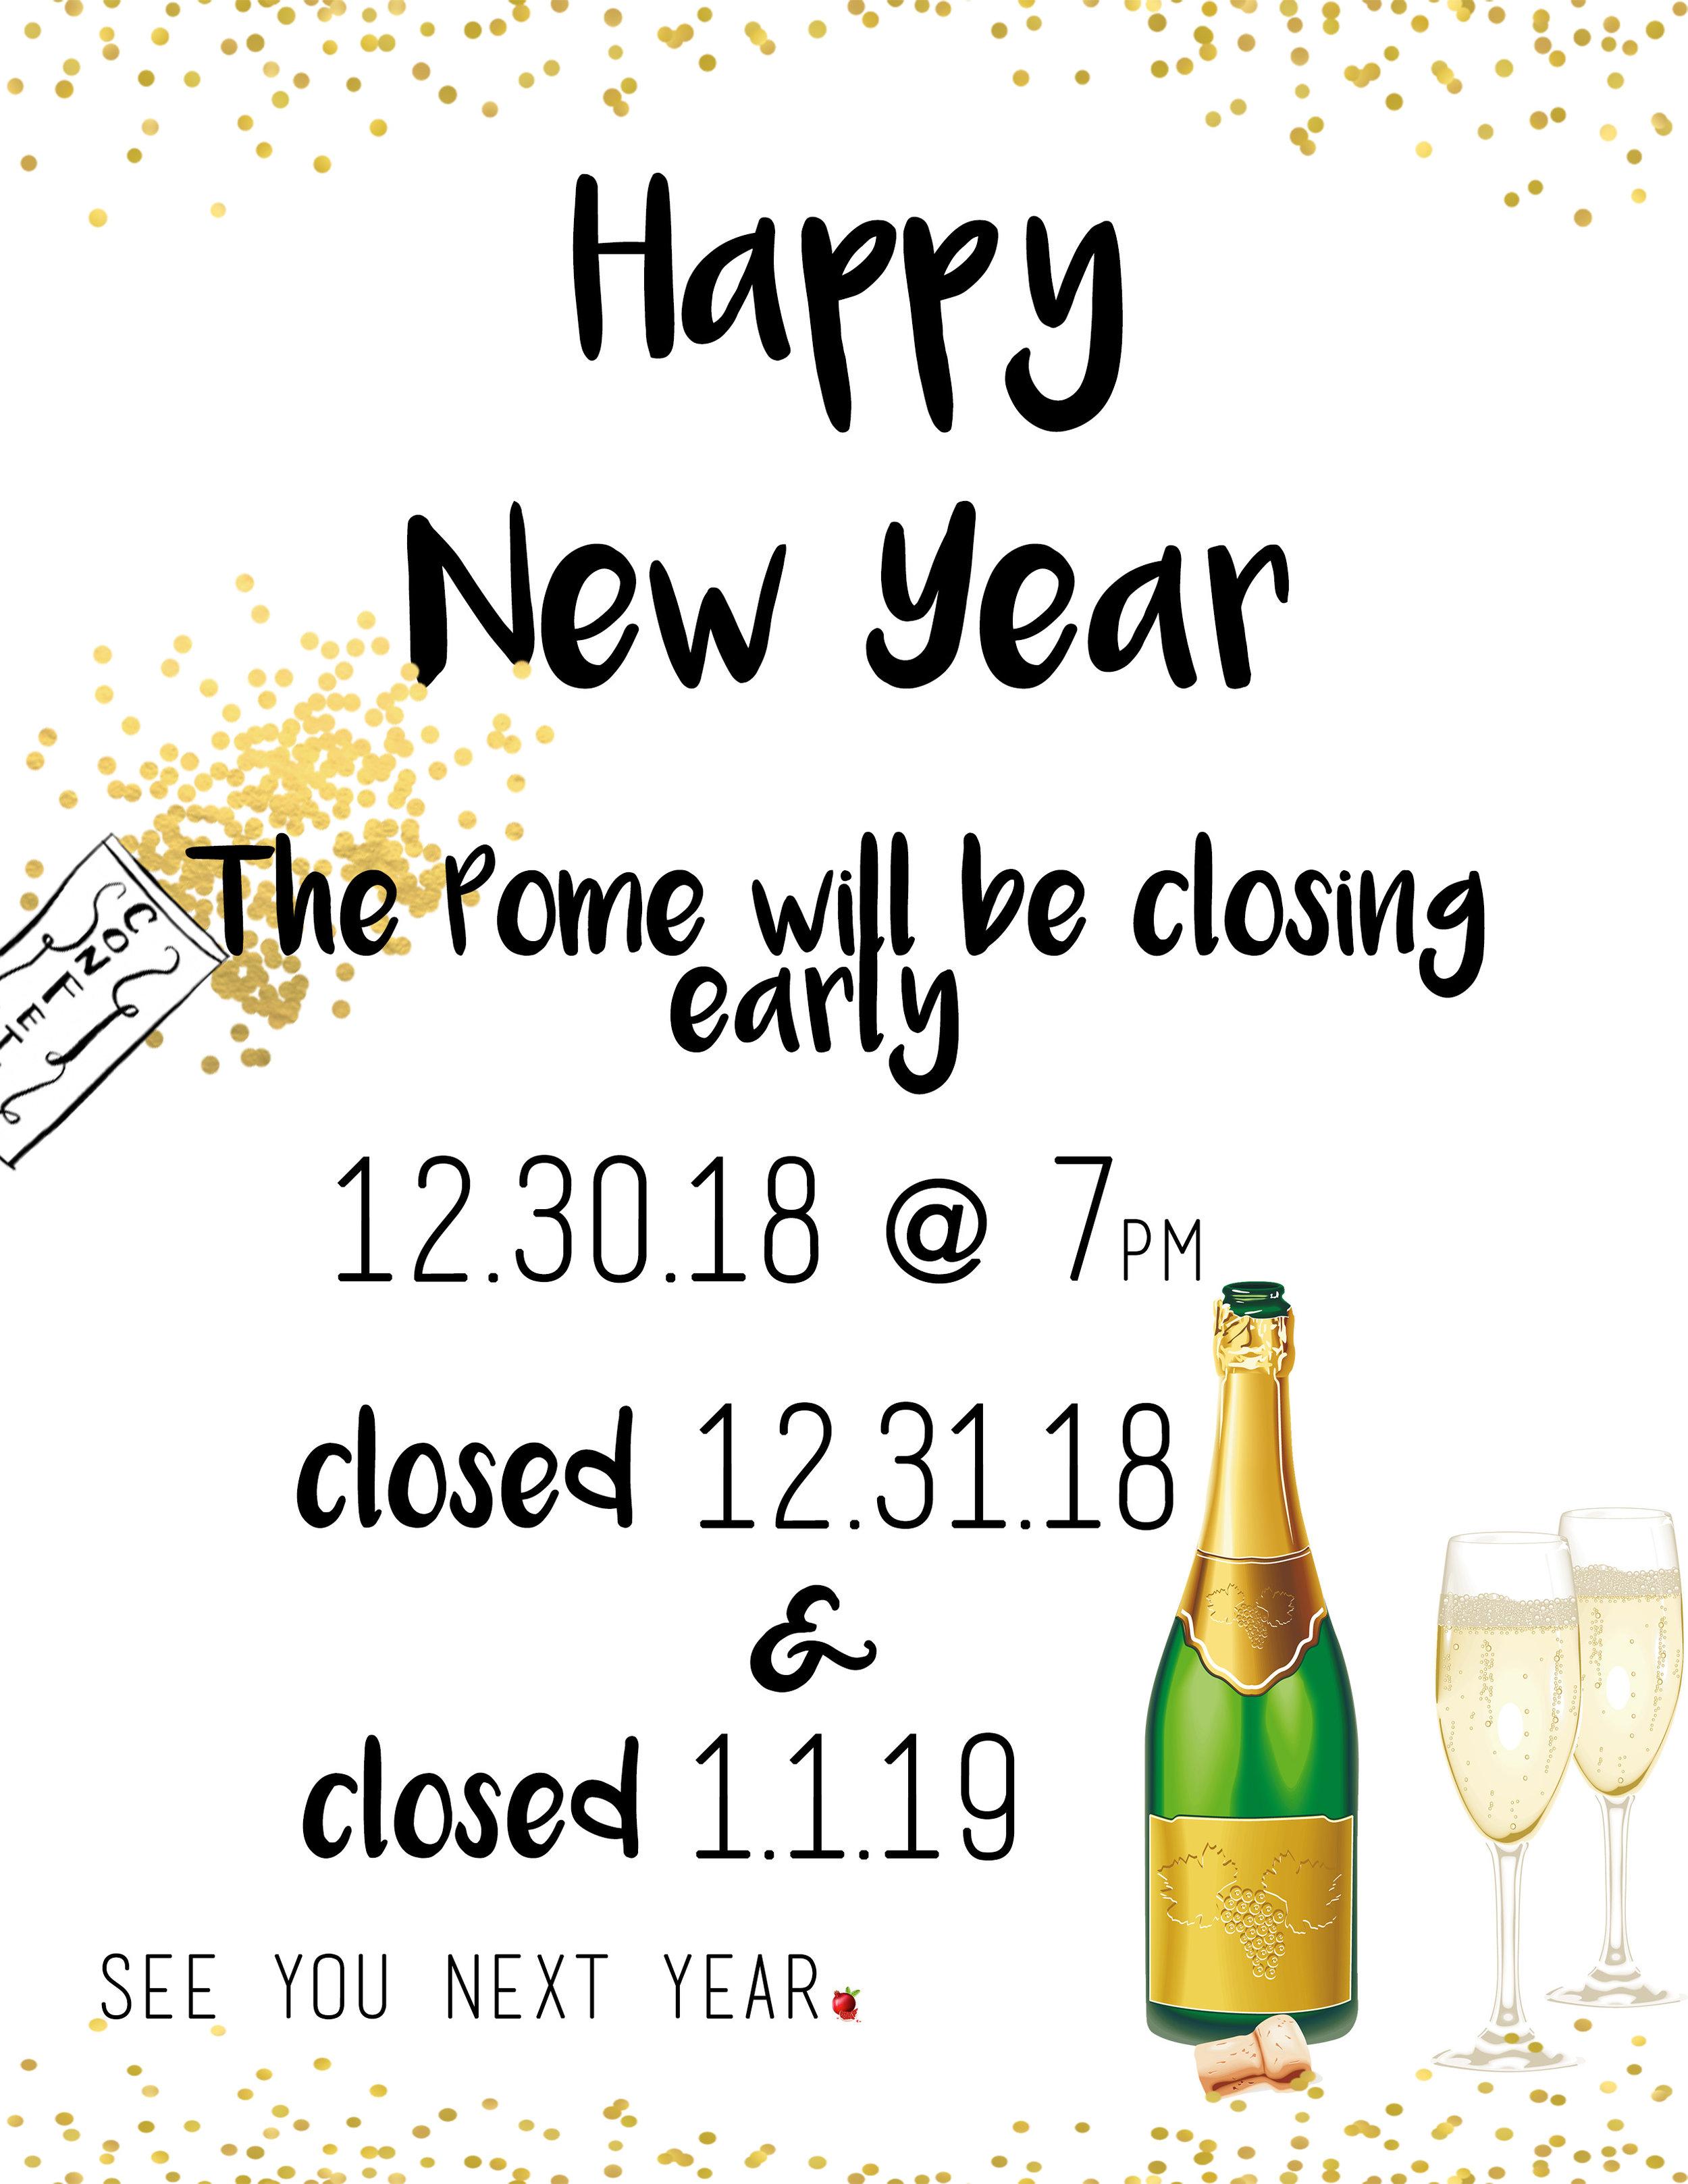 new year announced_Gary_2018.jpg